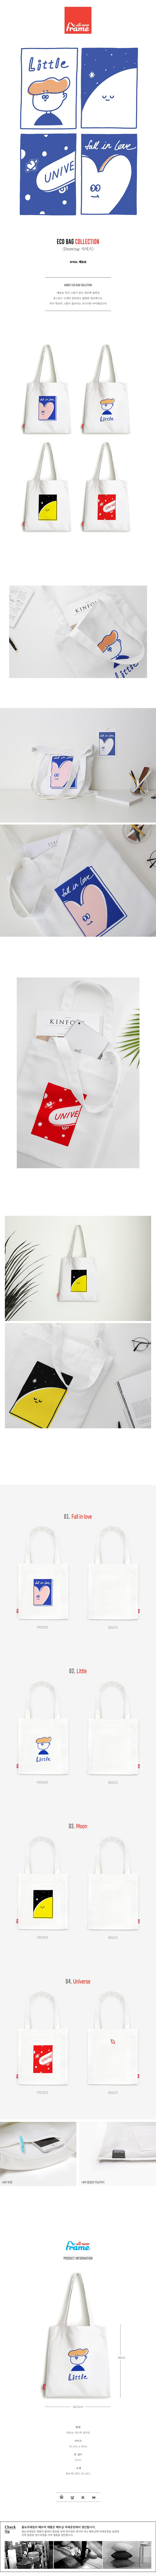 (ECO BAG) Drawingn 시리즈 - 올뉴프레임, 22,000원, 캔버스/에코백, 에코백